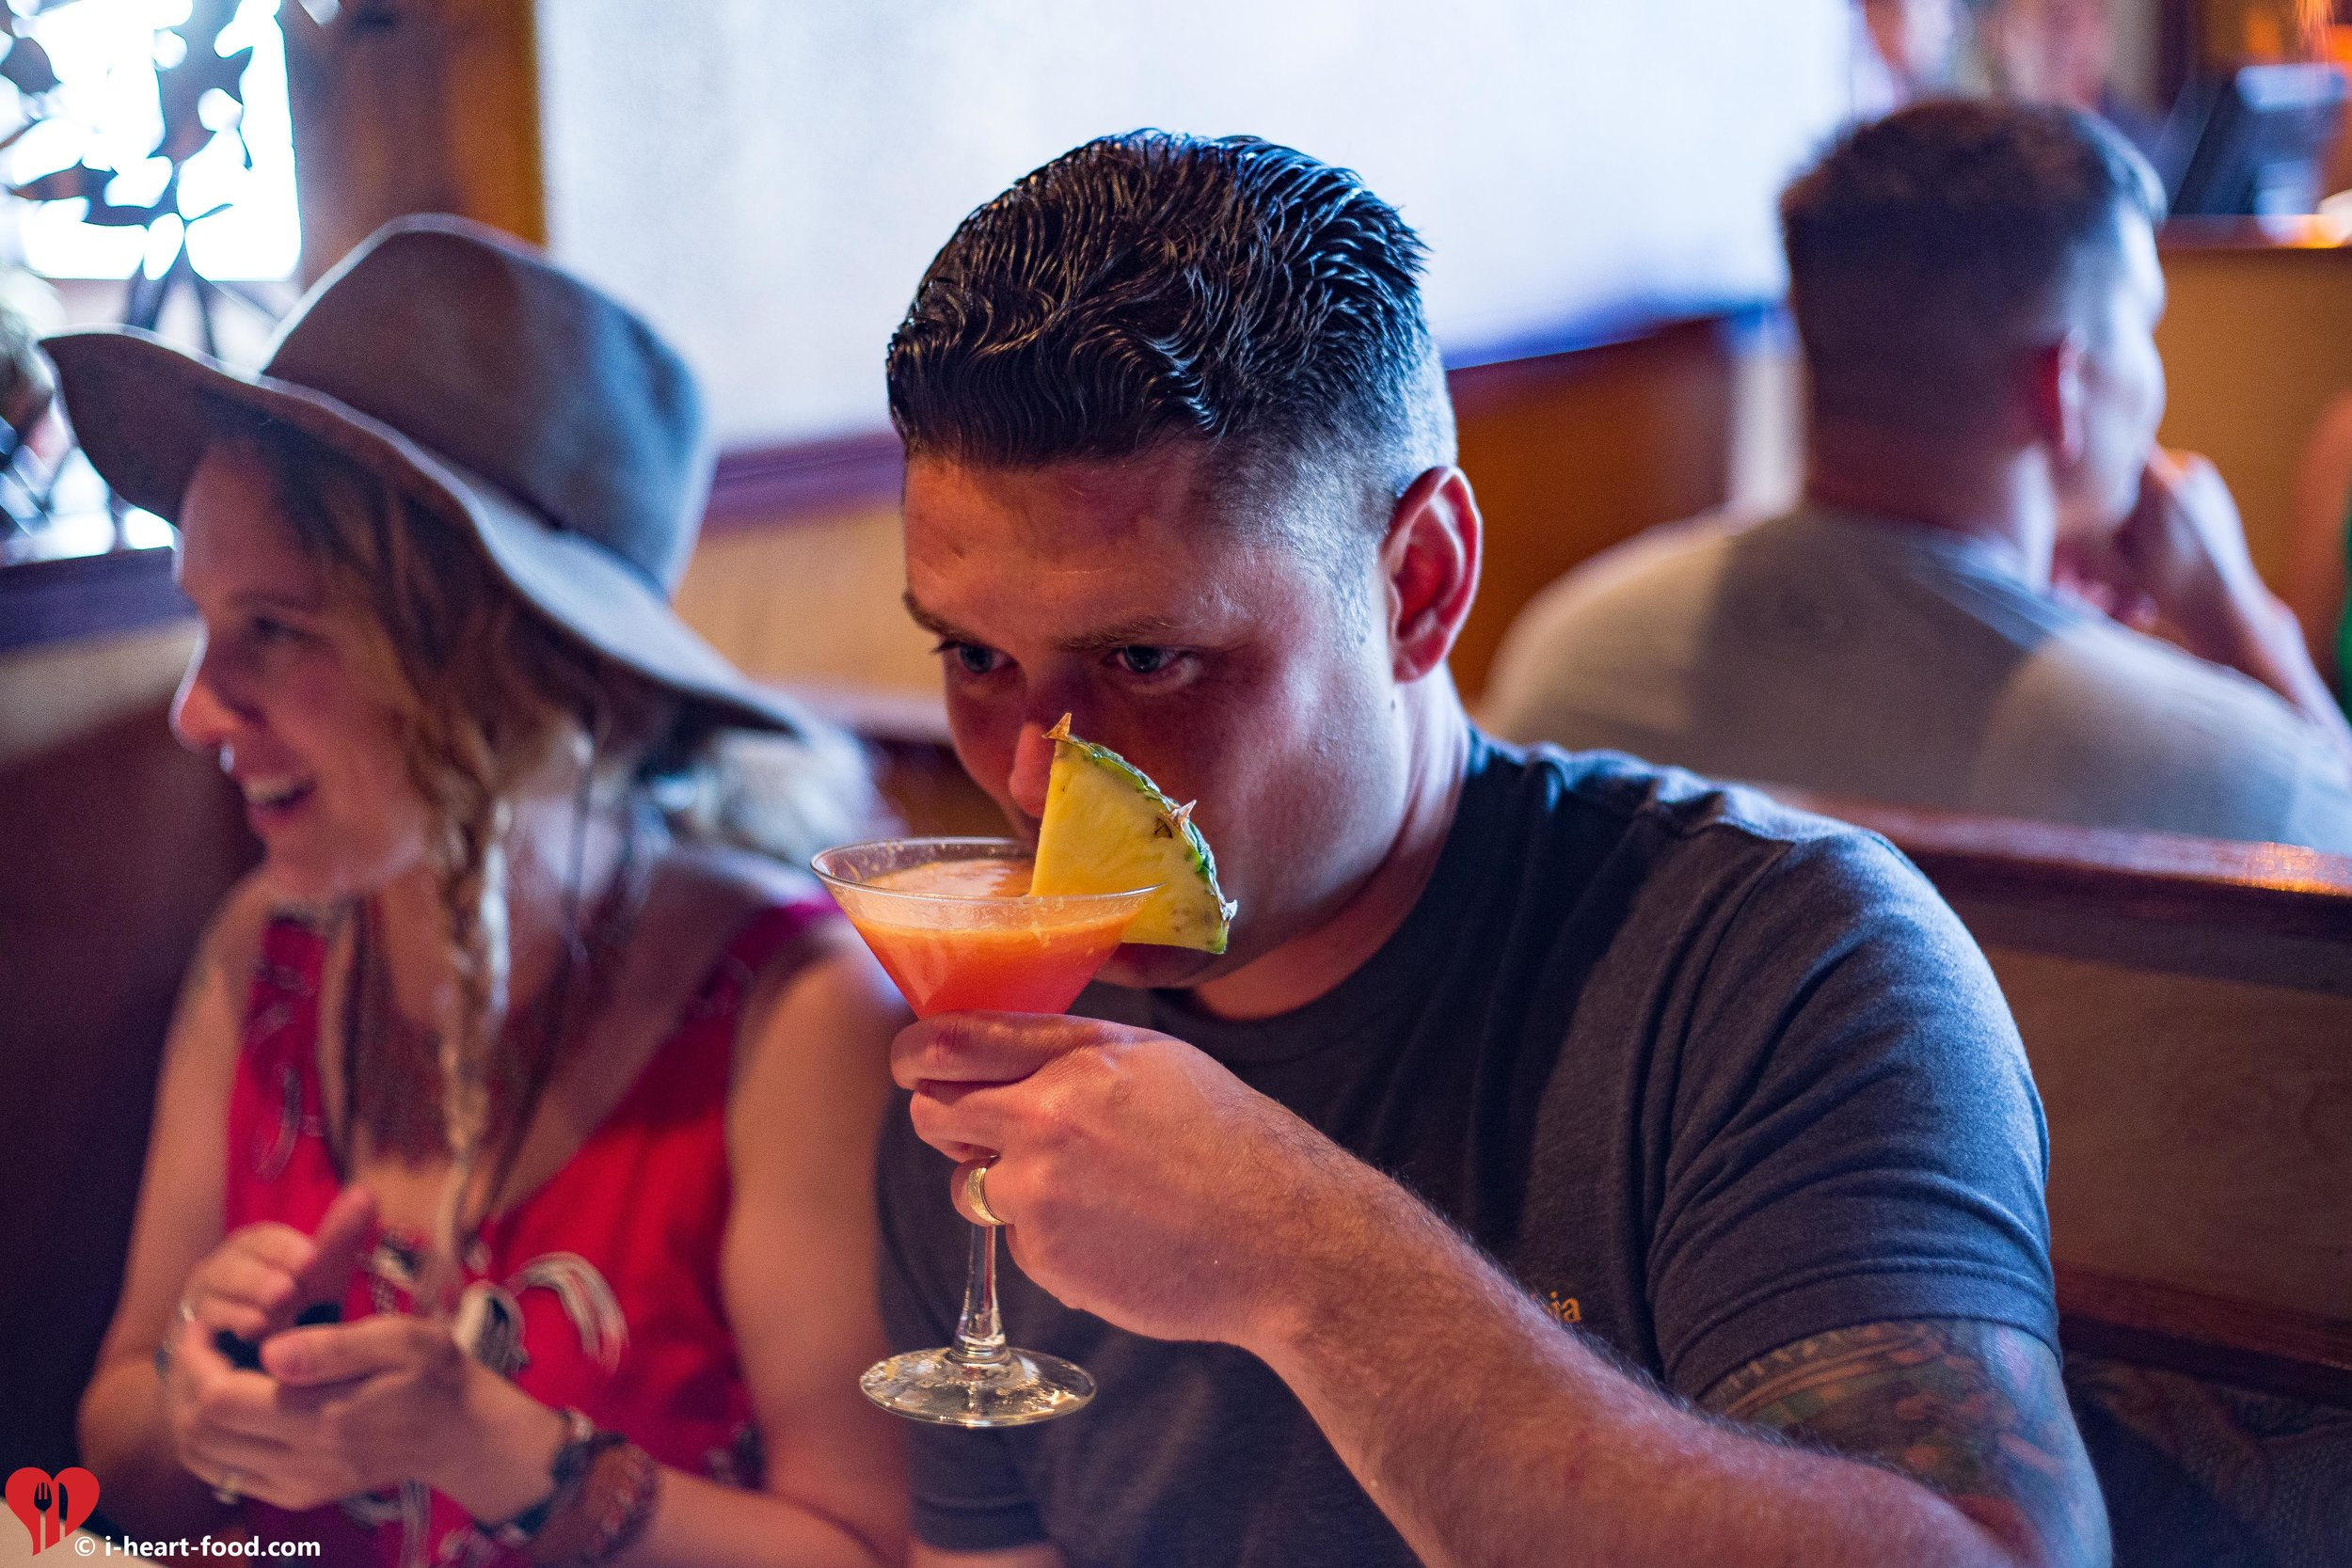 The whiskey man enjoying a fancy drink.